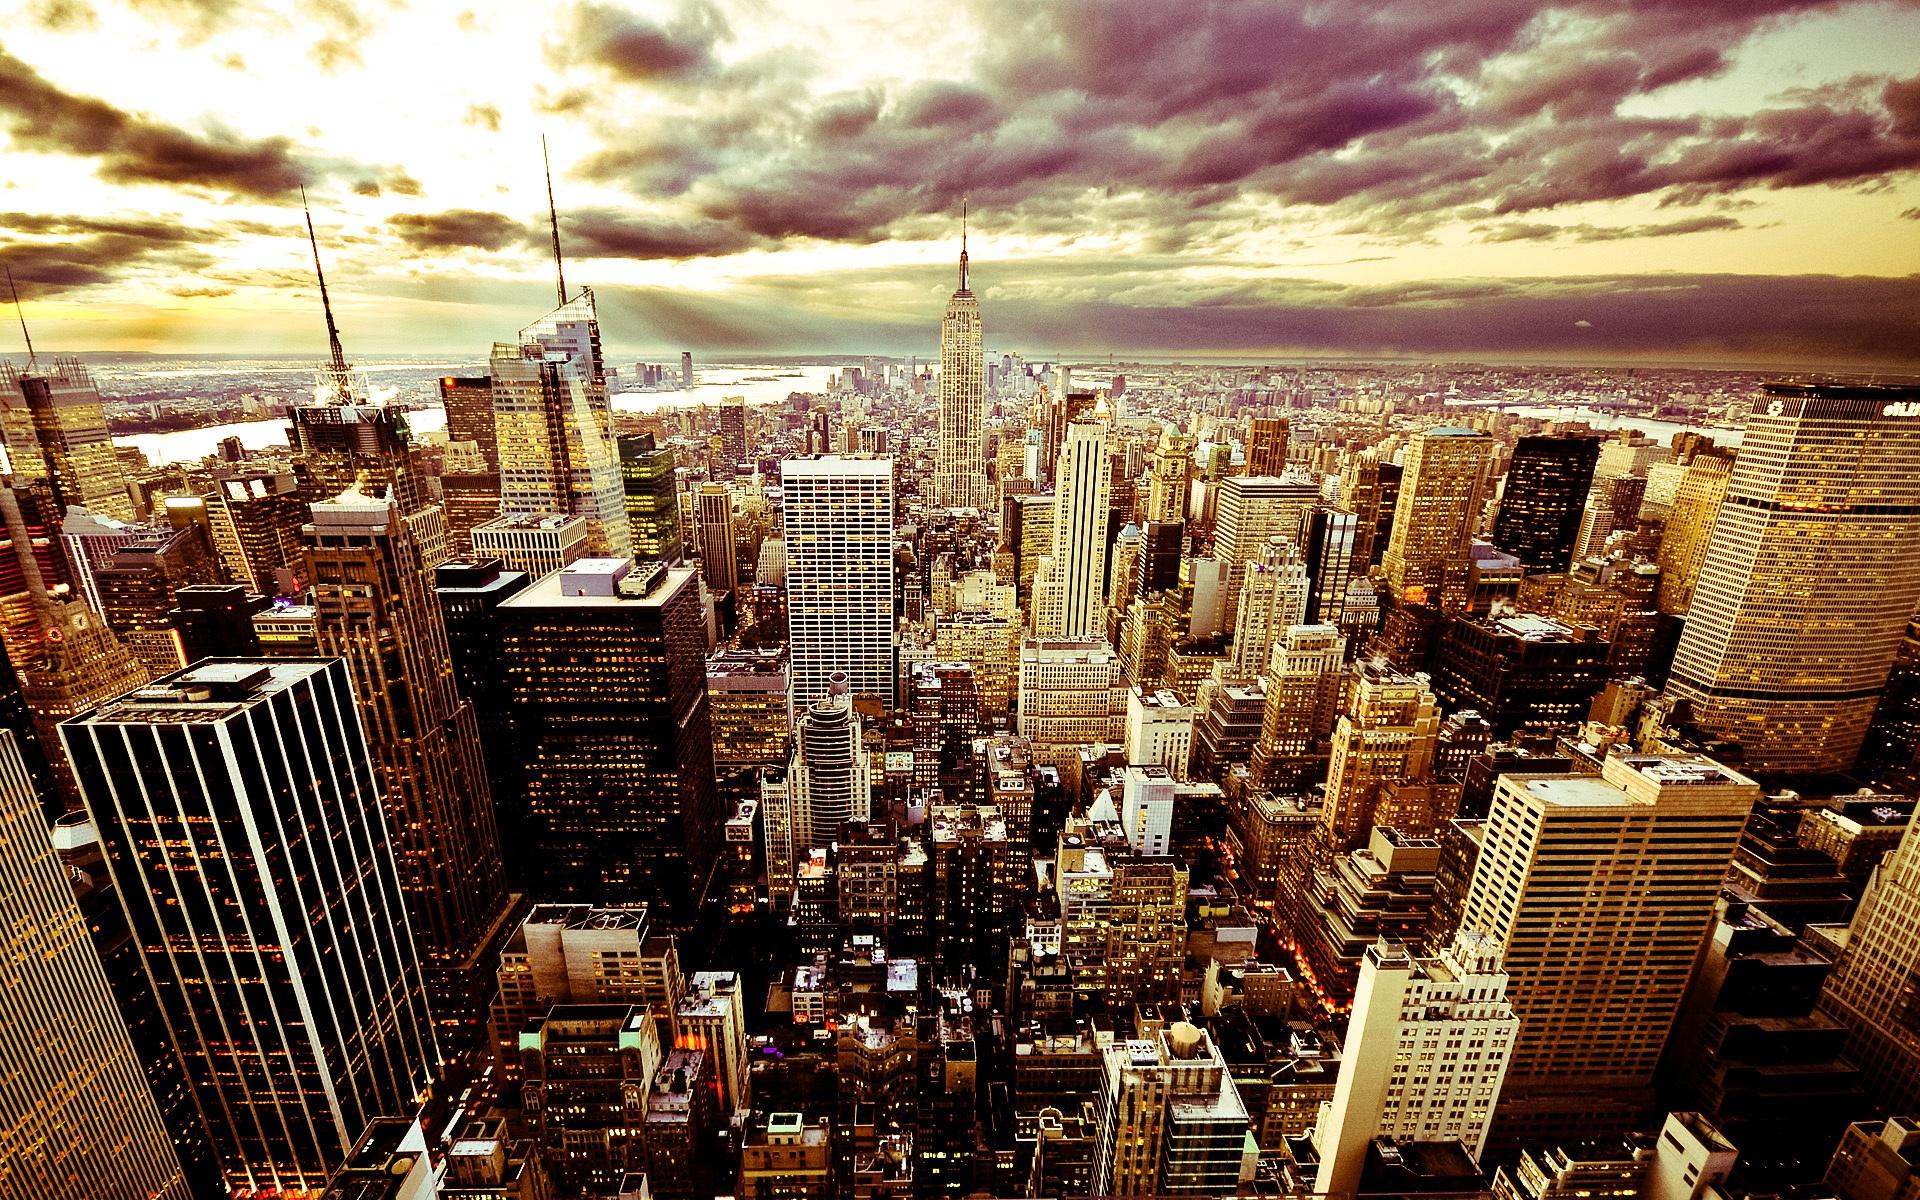 City Night Sky Clouds America USA New York Skyscrapers Buildings Beautiful